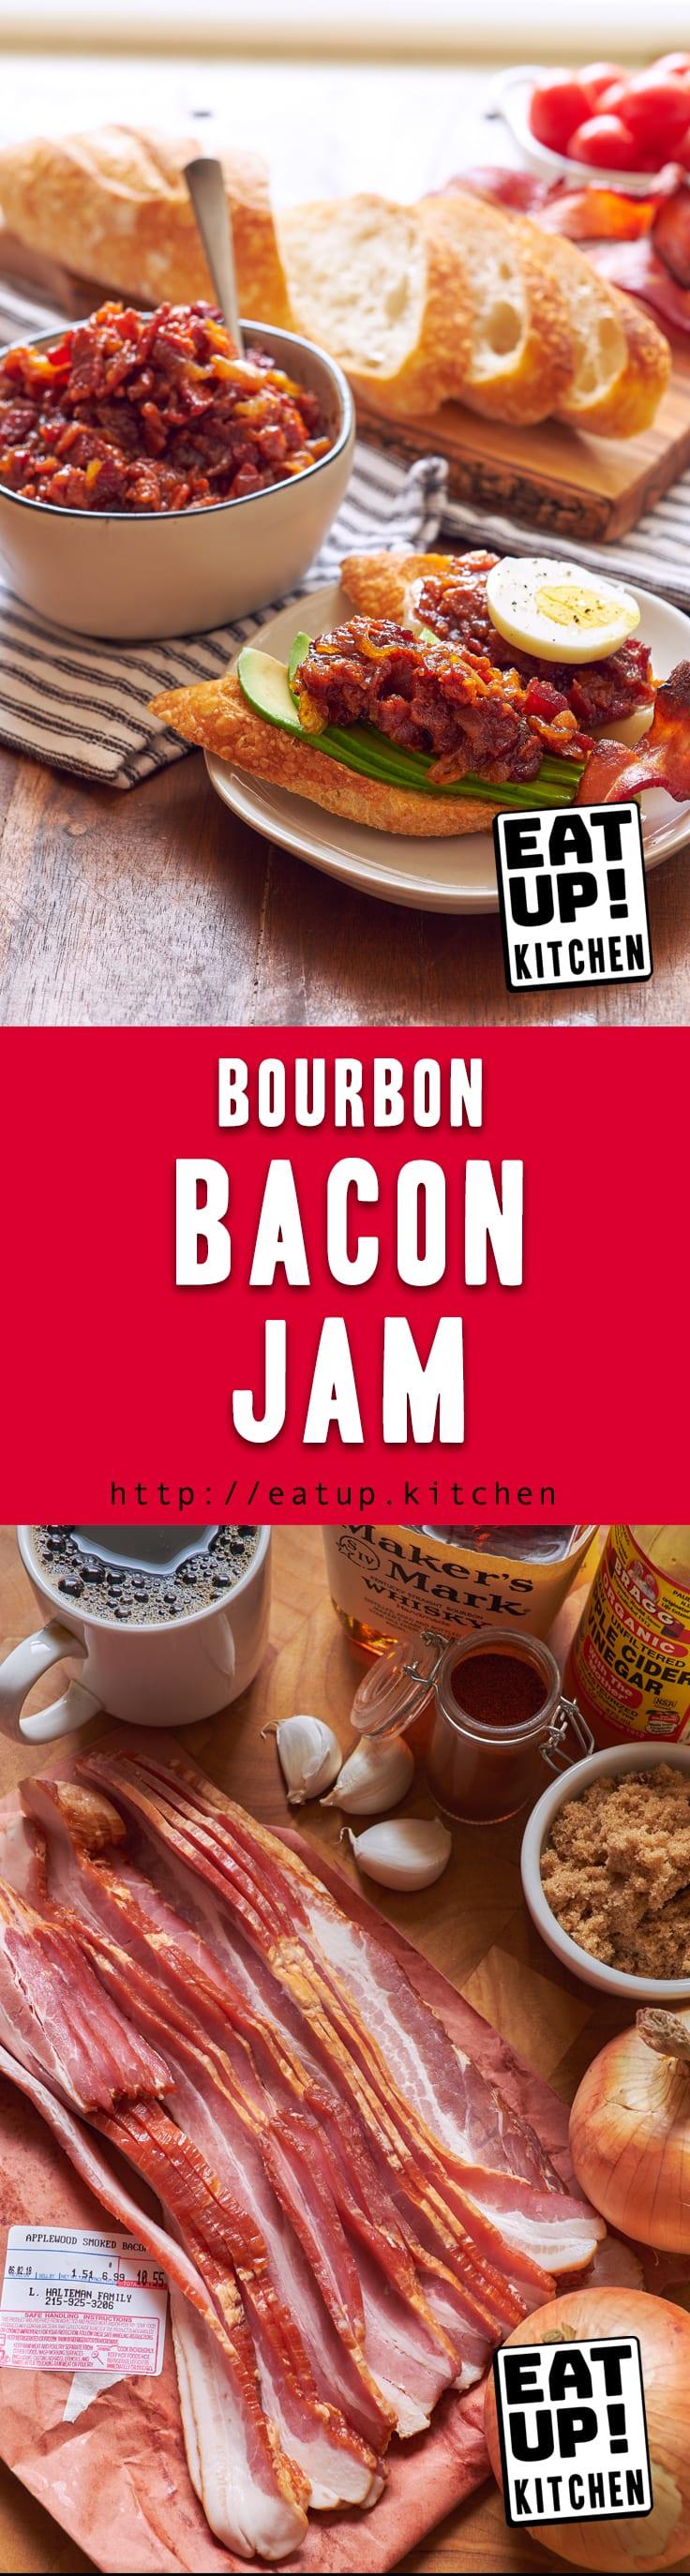 Bourbon Bacon Jam